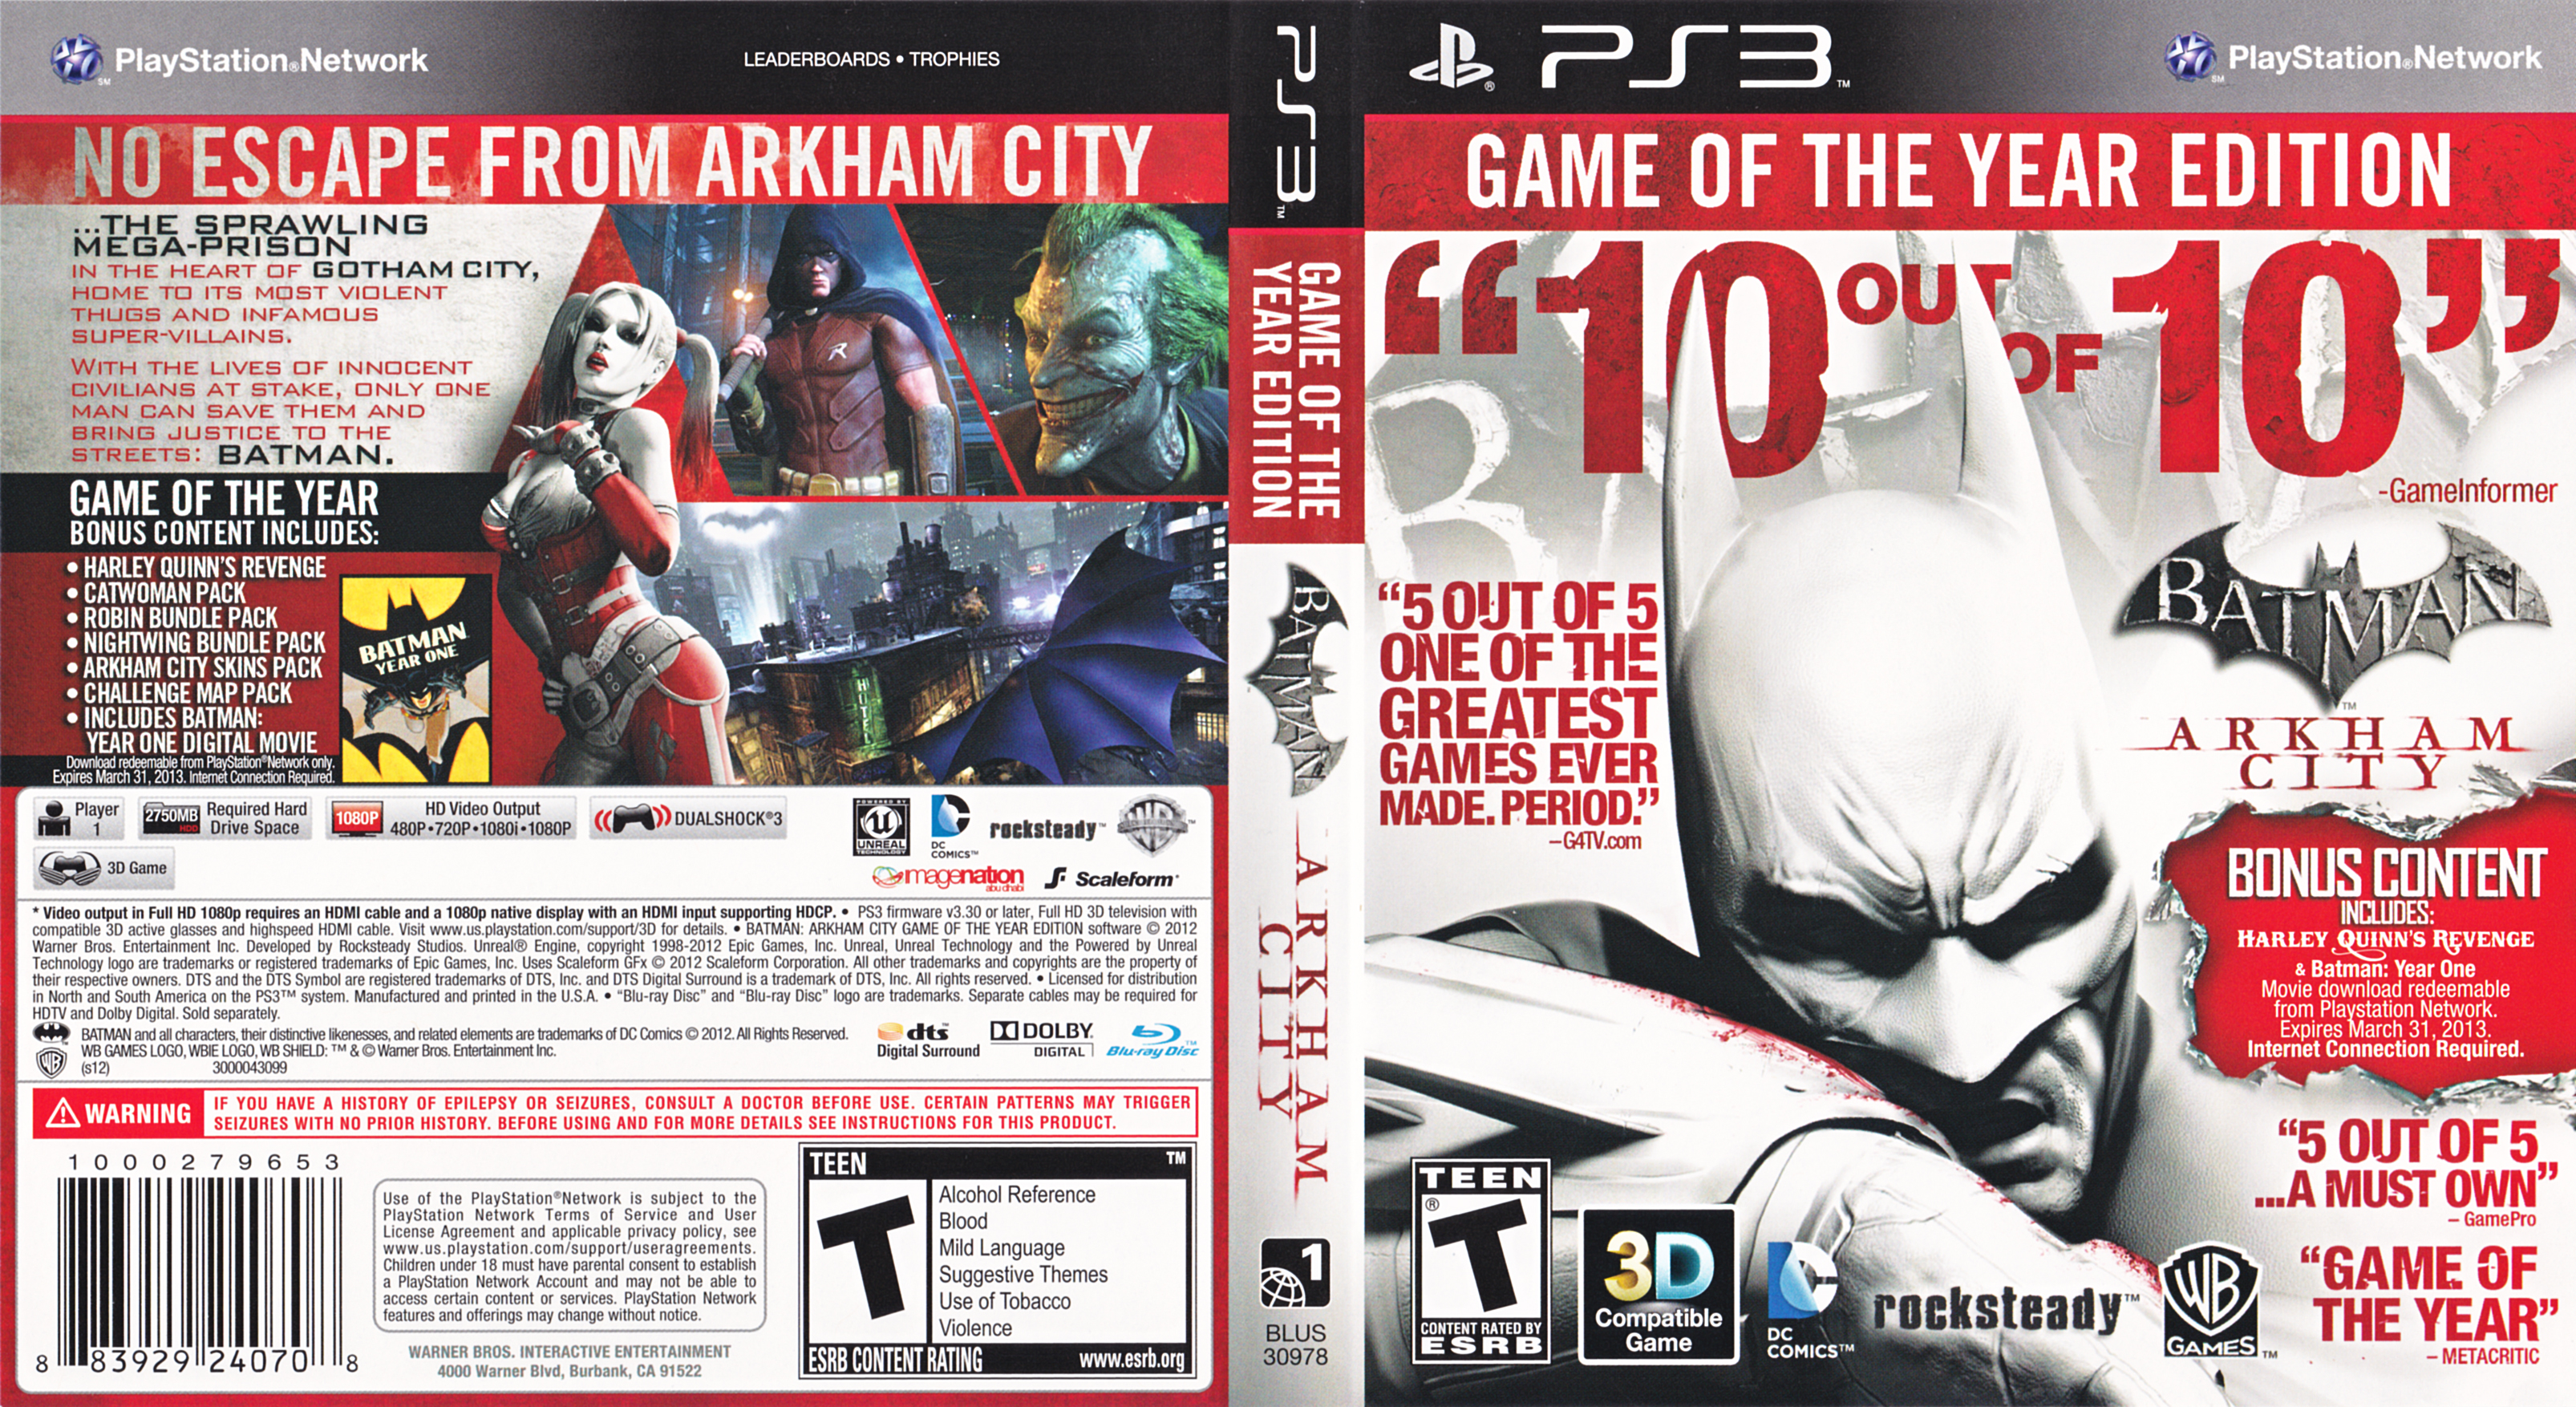 Batman_ArkhamCity_GOTY_front